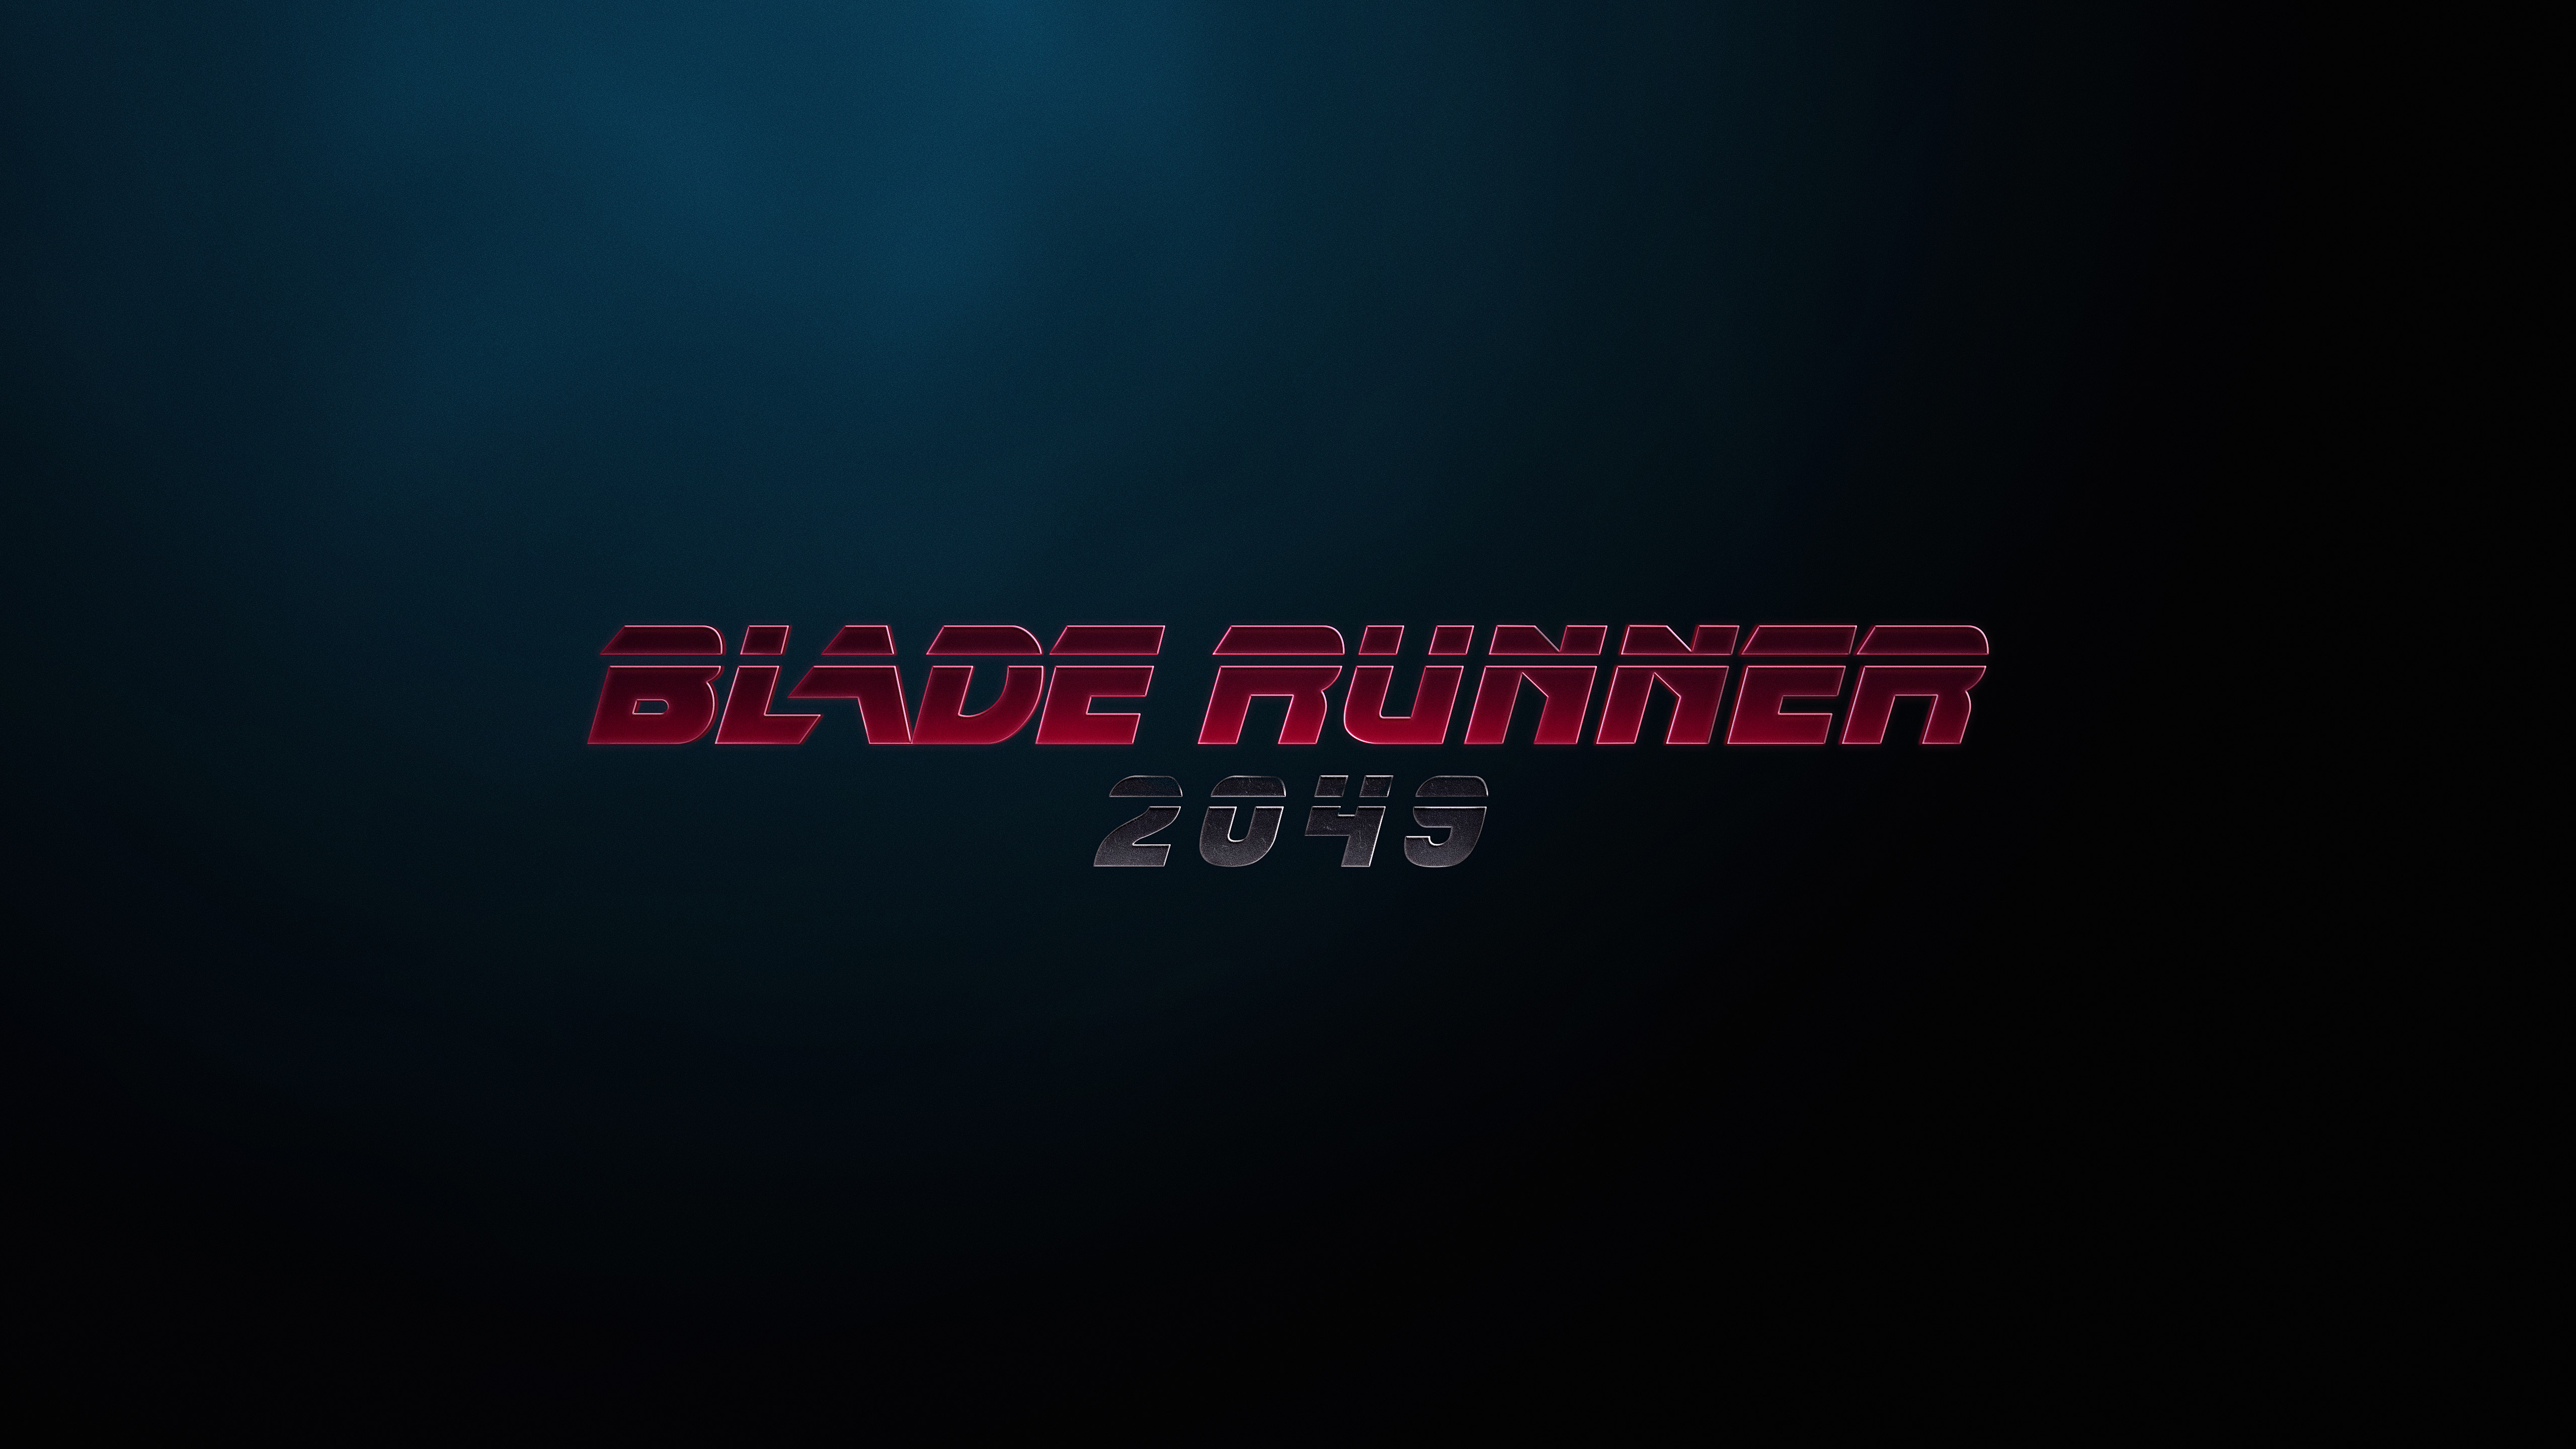 Blade Runner 2049 Logo 5k Hd Movies 4k Wallpapers Images